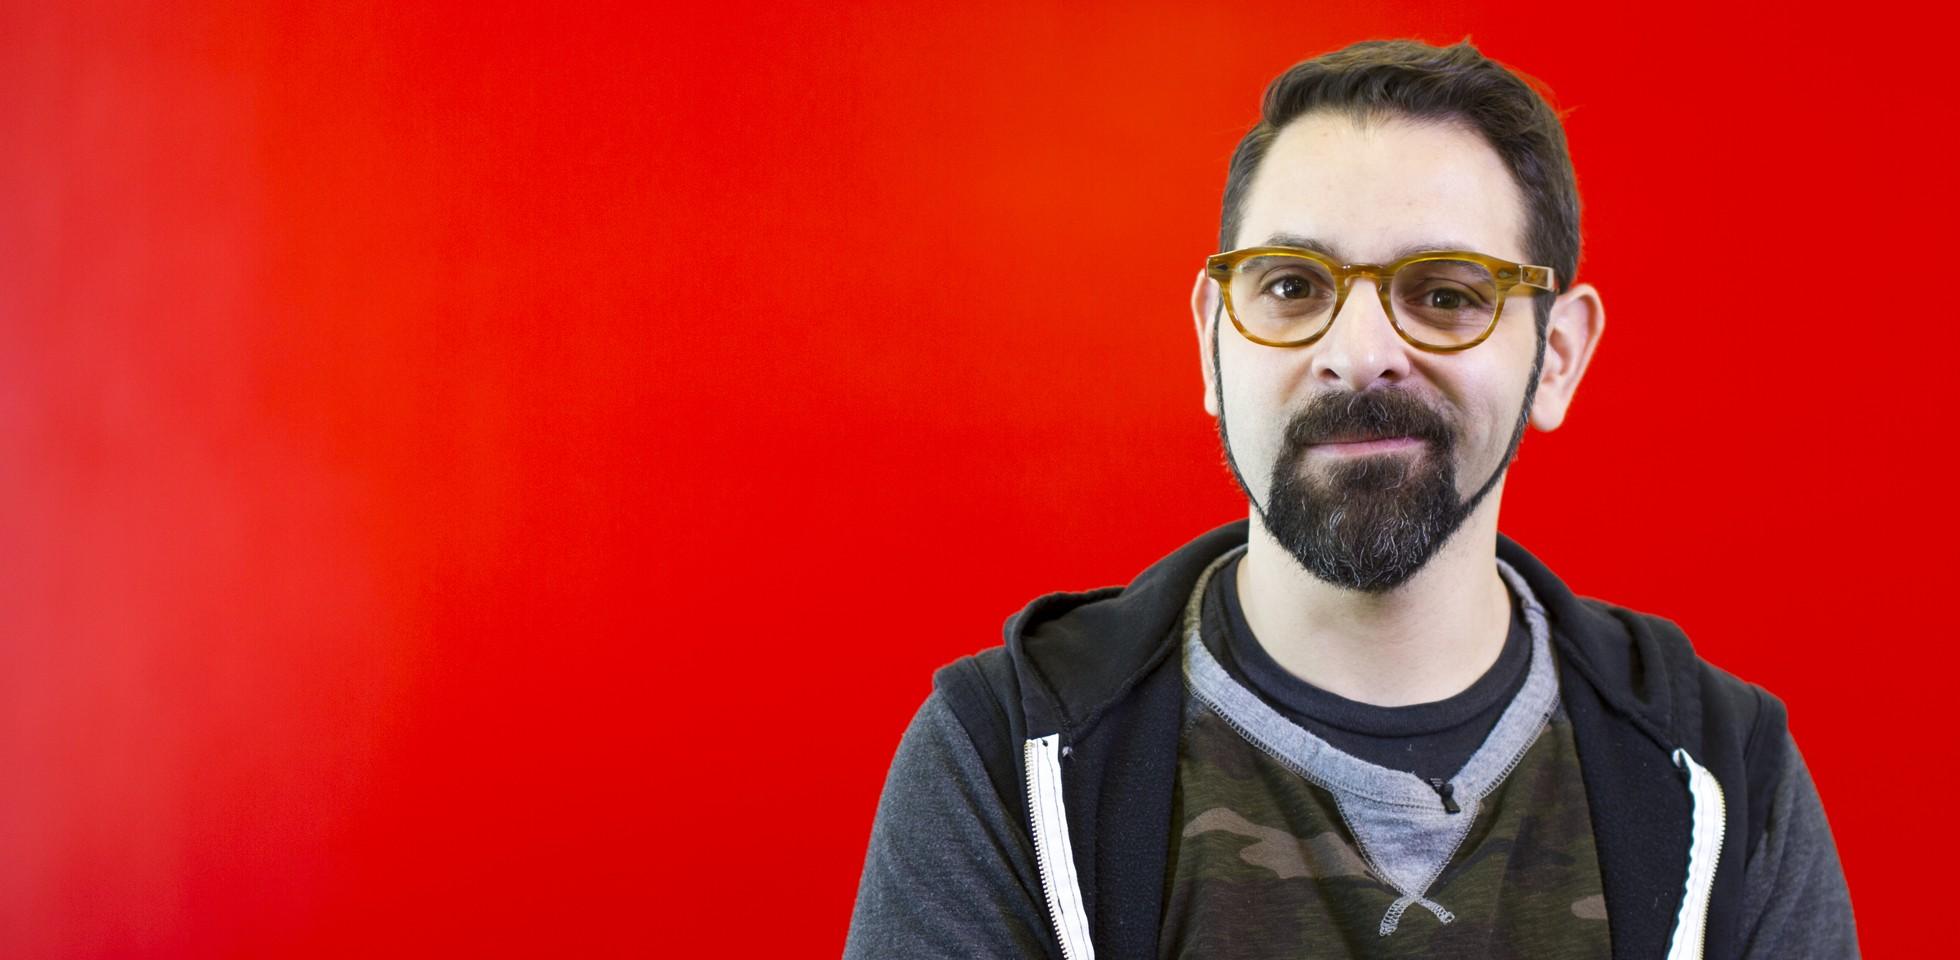 David Santana, Design Director - Some Spider Studios Careers